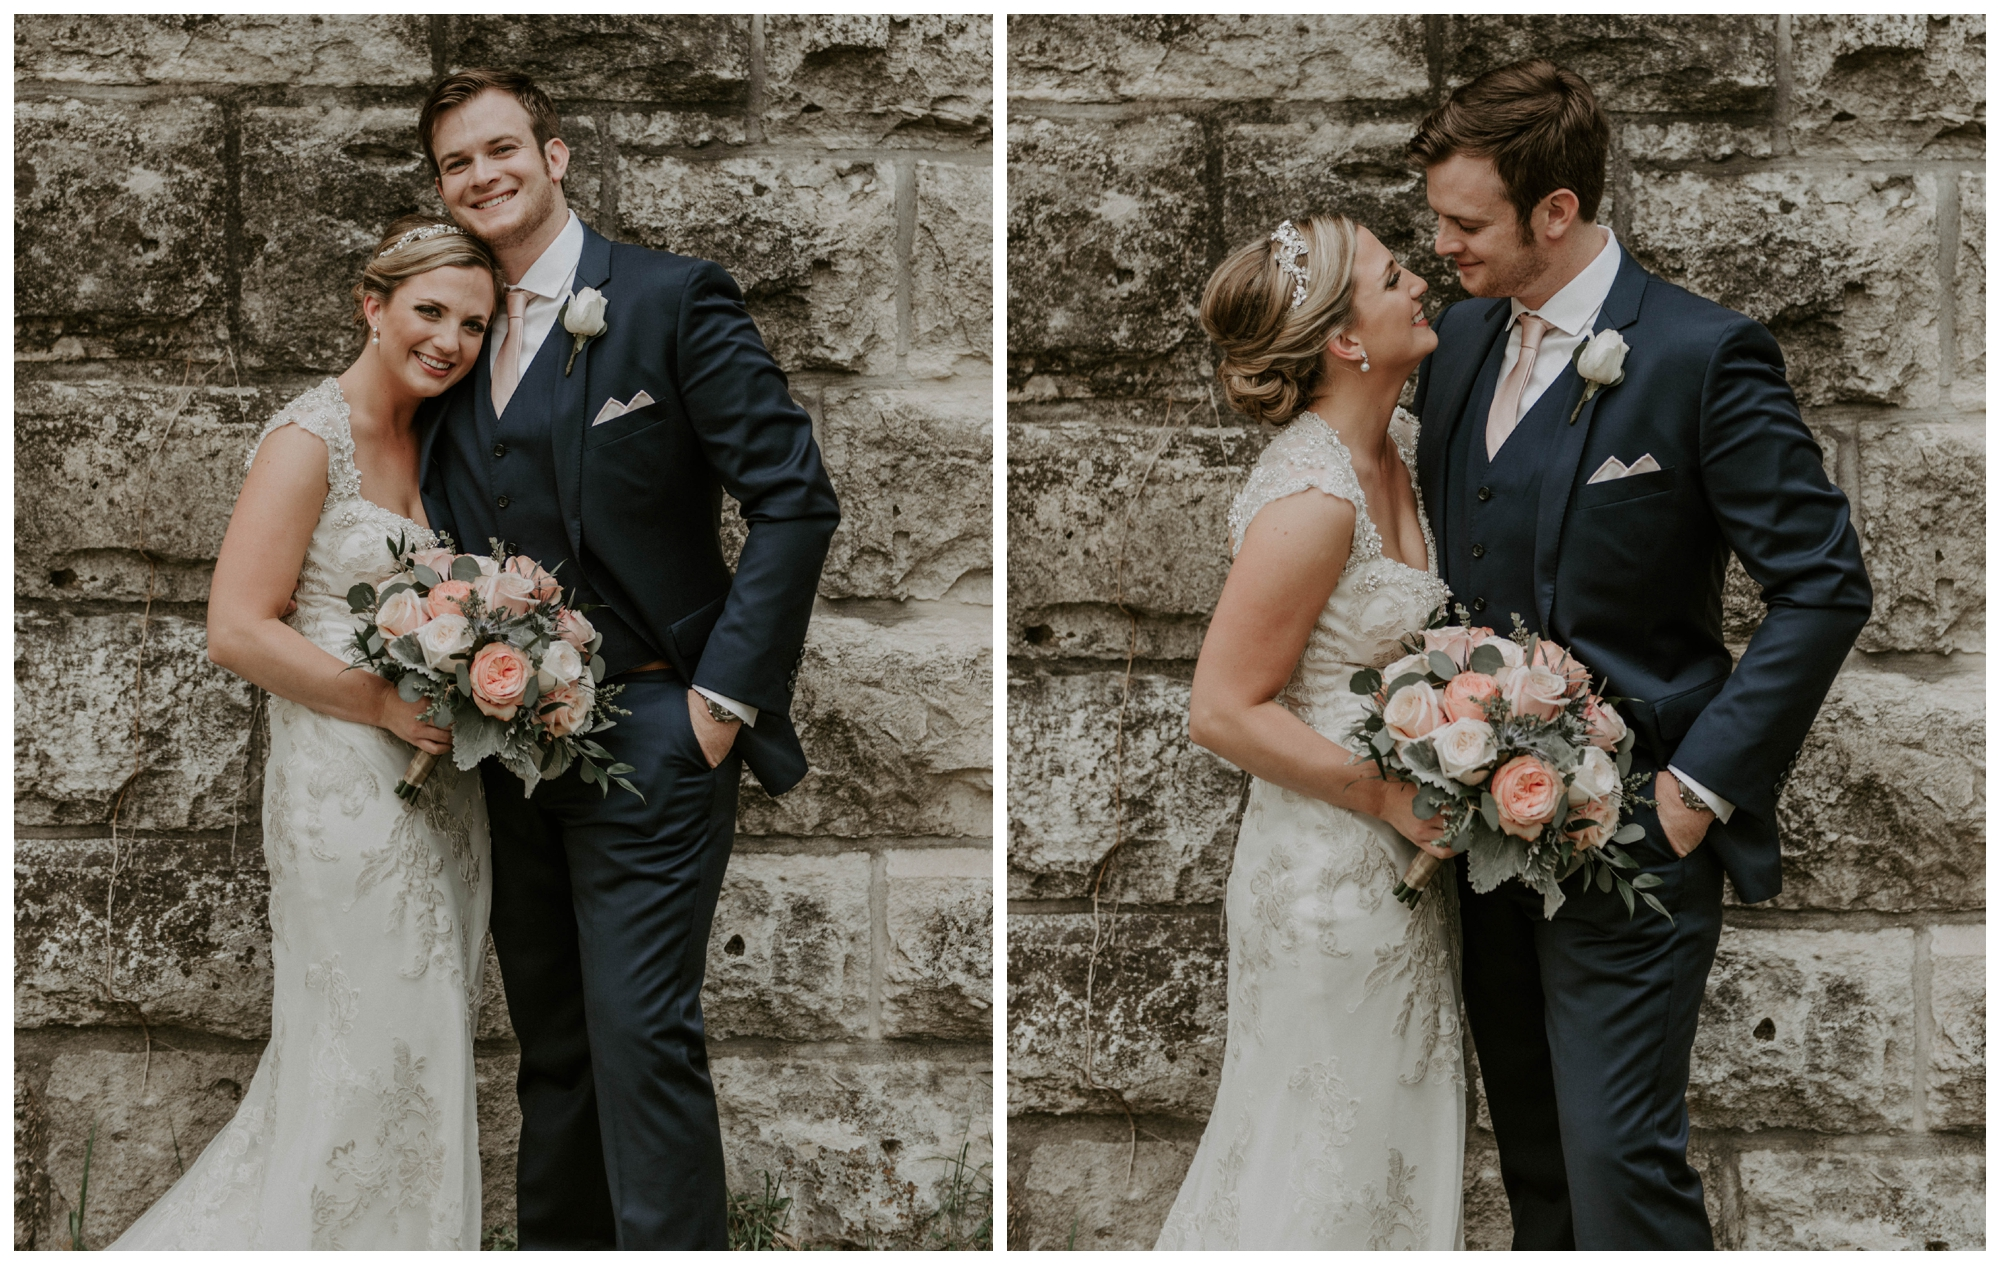 austin-texas-wedding-photography-1778-photographie_0096.jpg